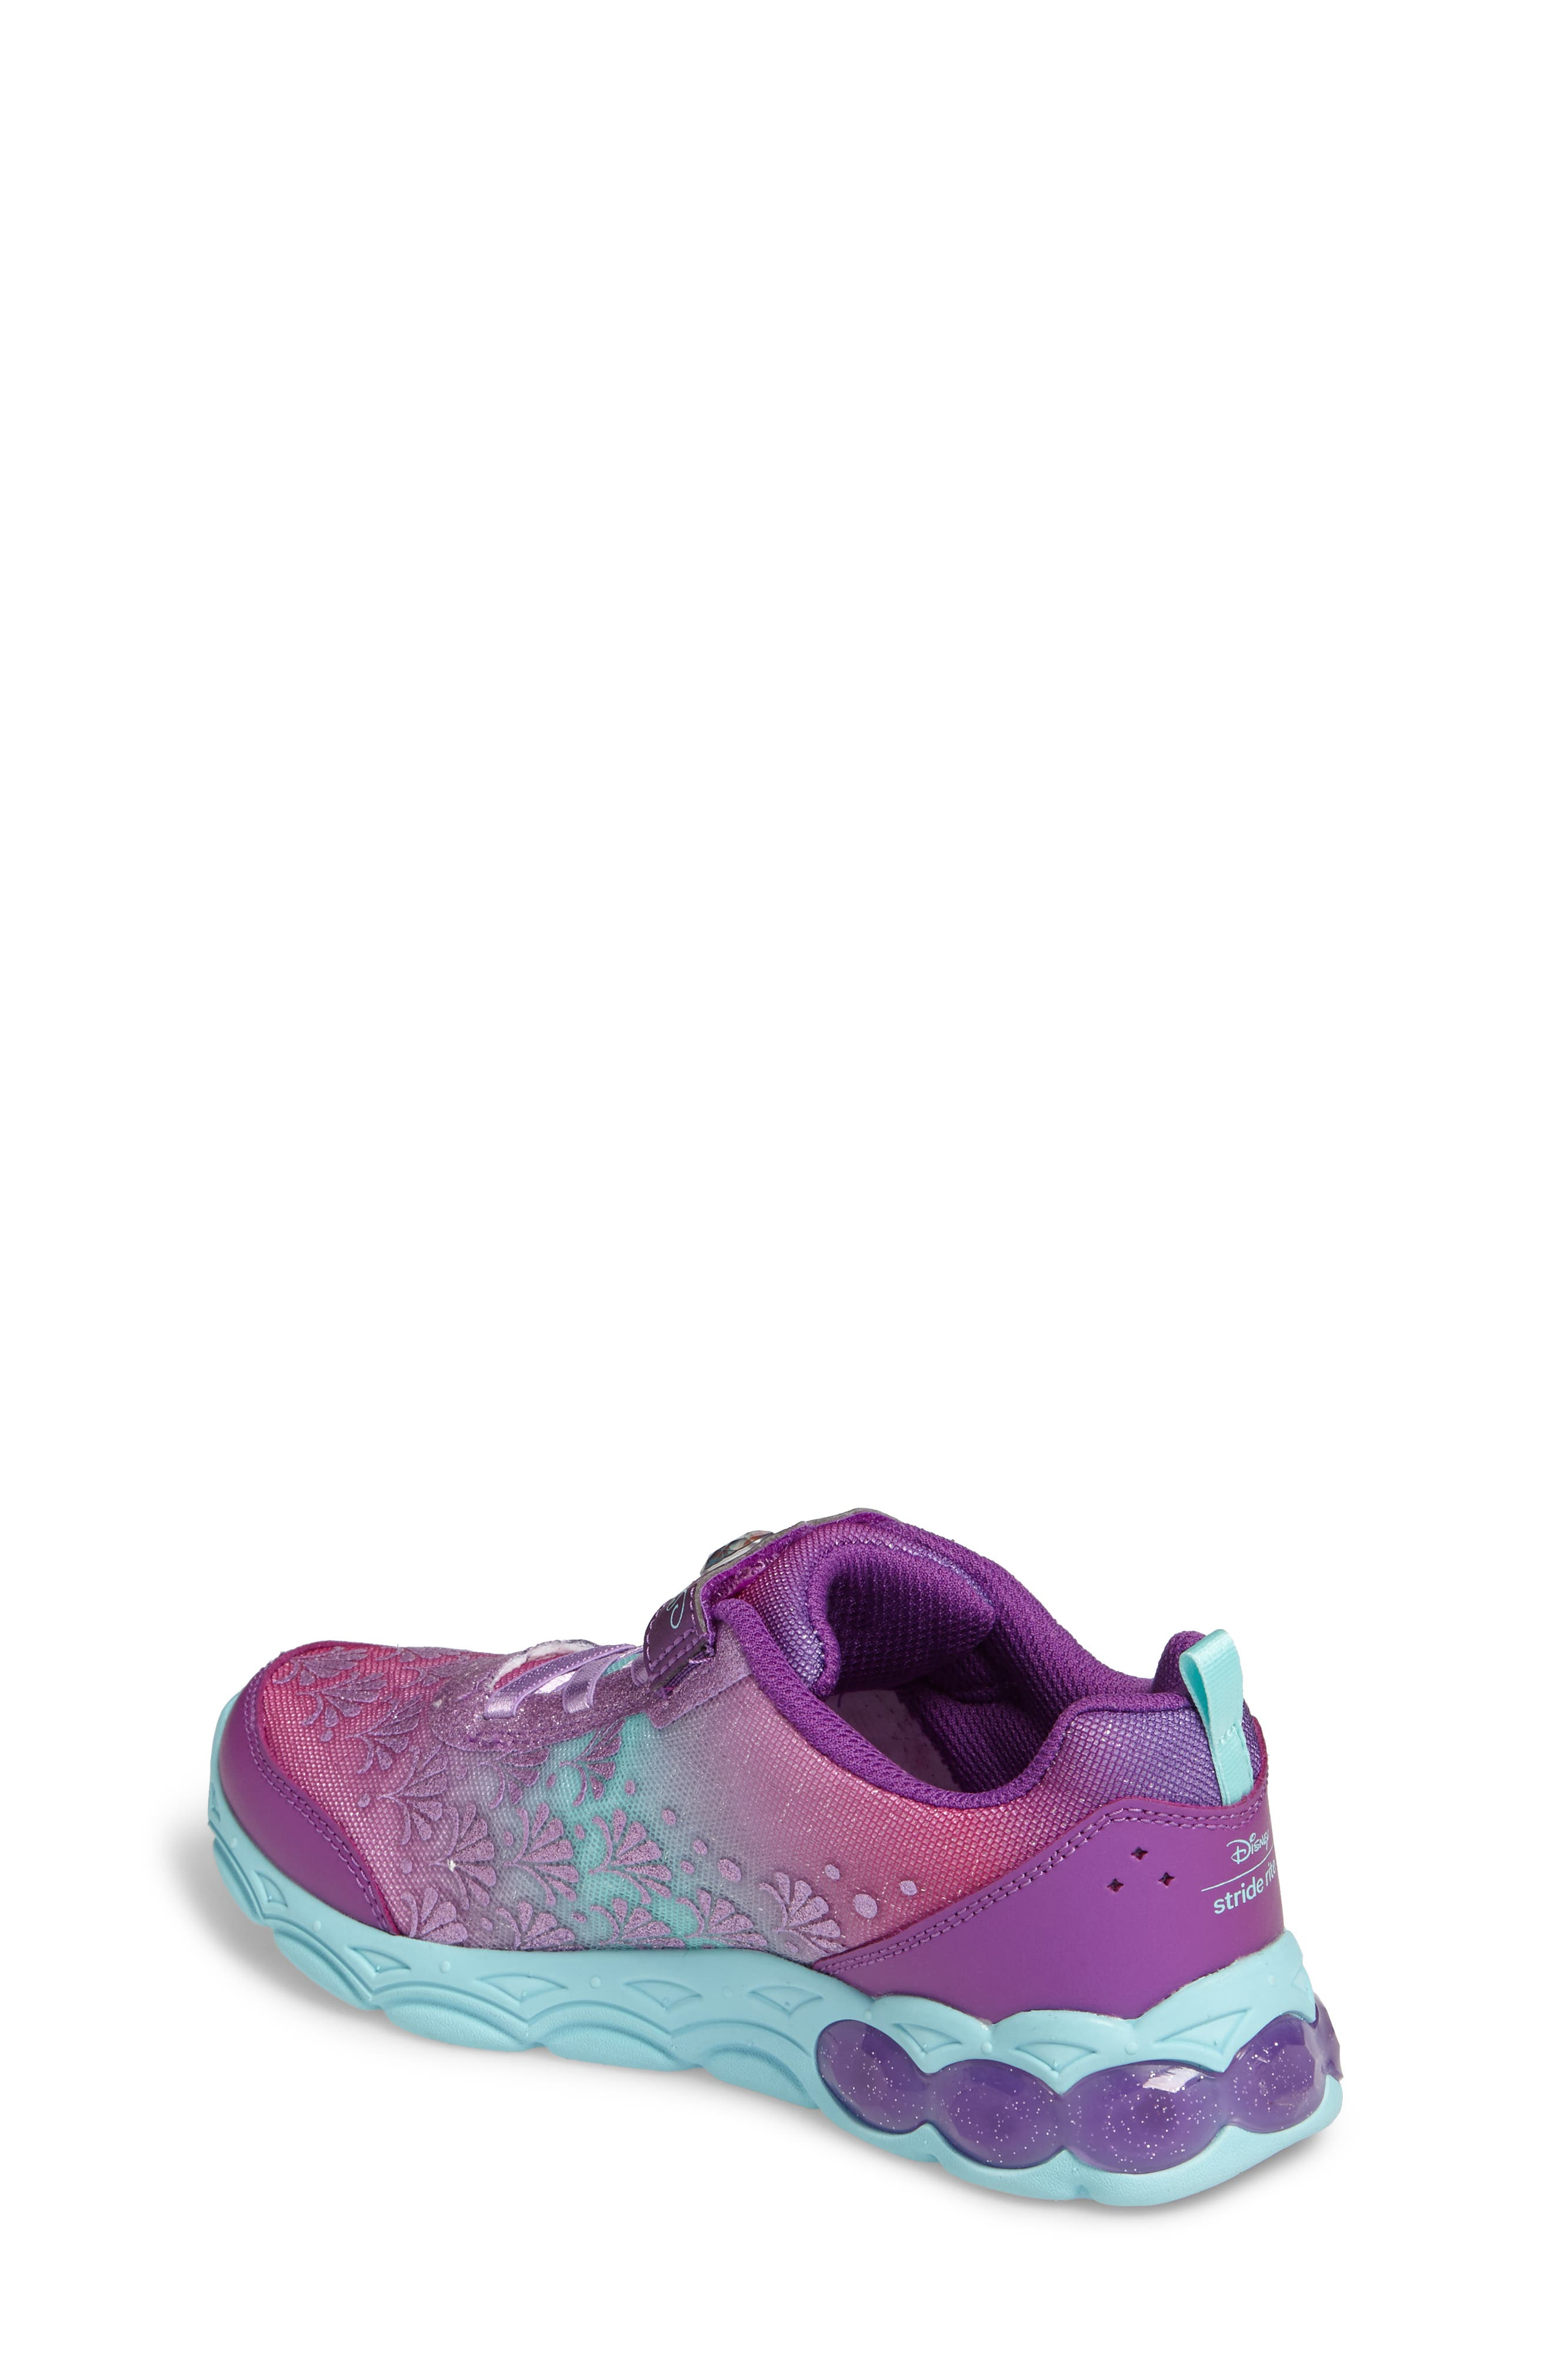 Alternate Image 2  - Stride Rite Disney® Ariel Ocean Adventurer Light-Up Sneaker (Walker, Toddler & Little Kid)